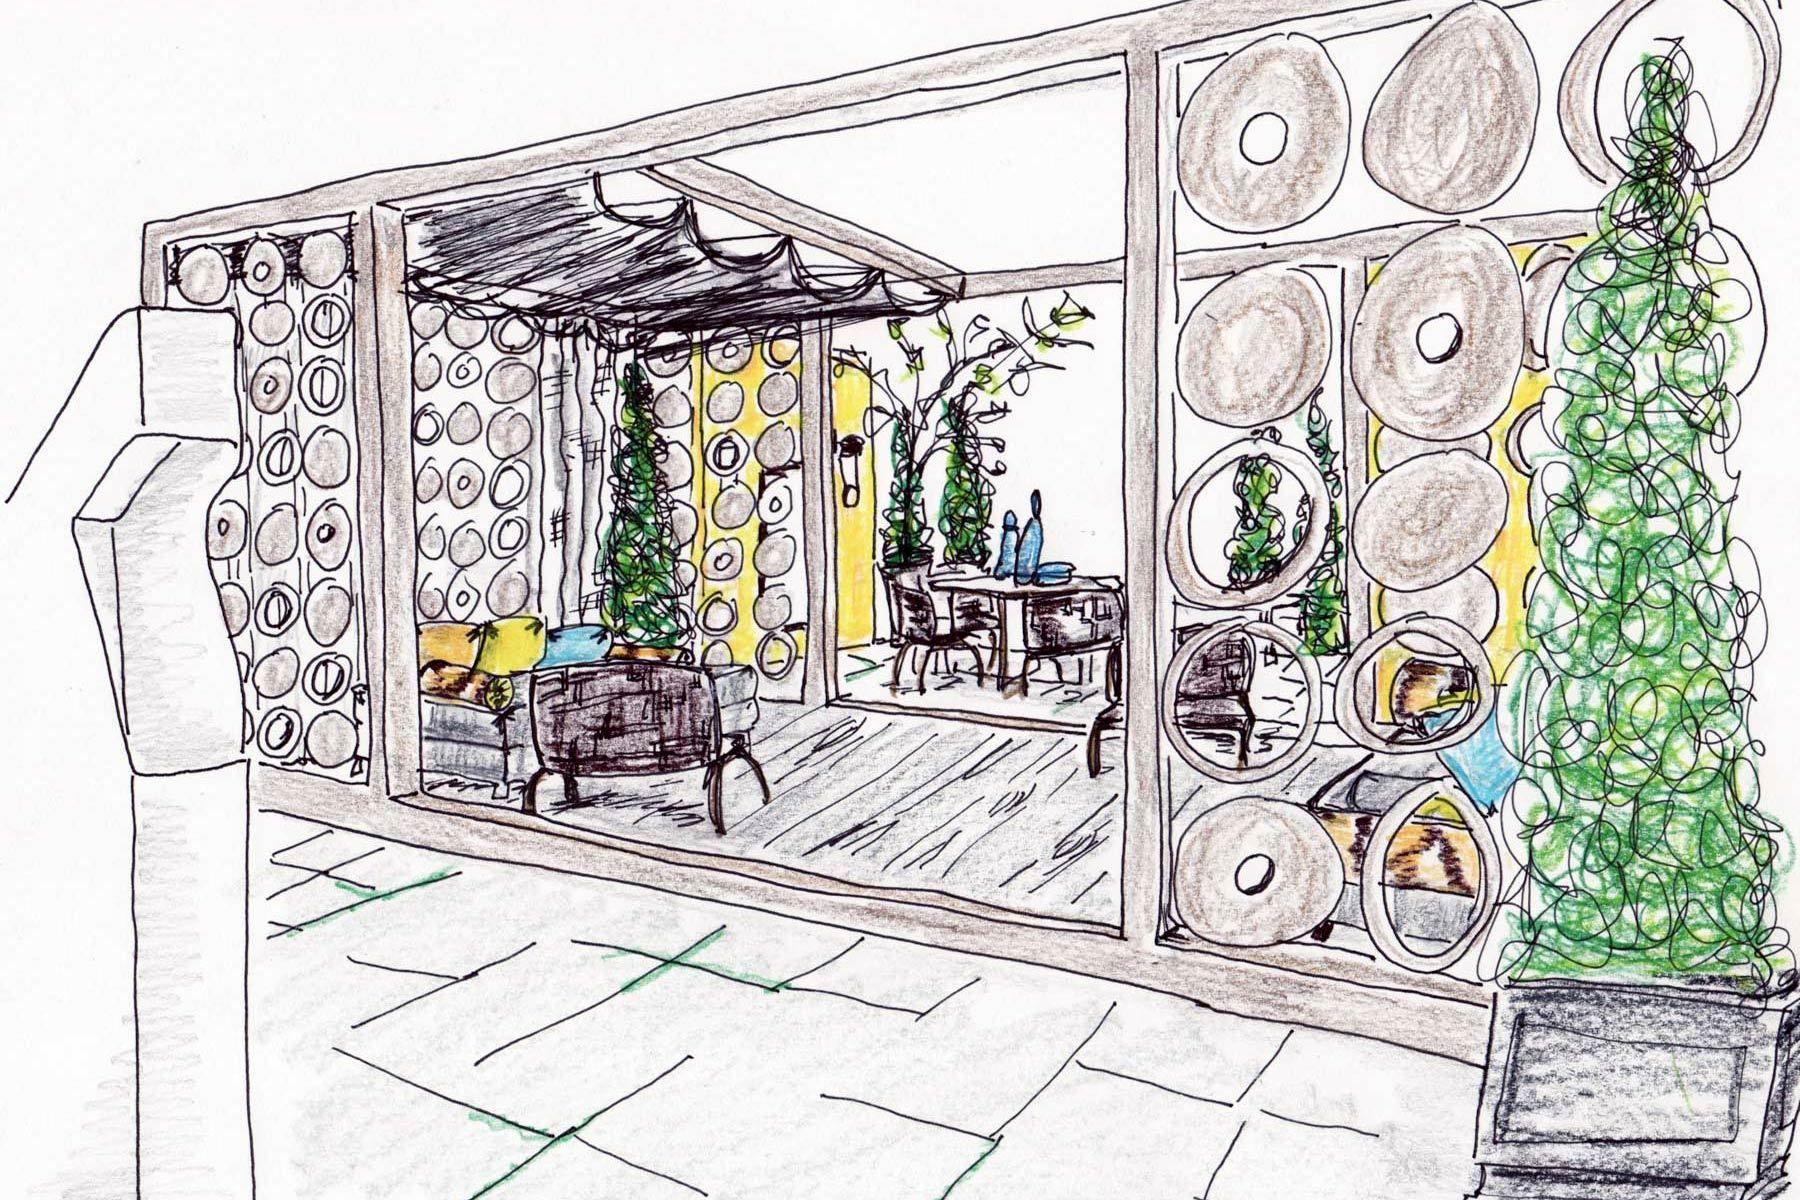 Garden Sketch by Michael Tavano